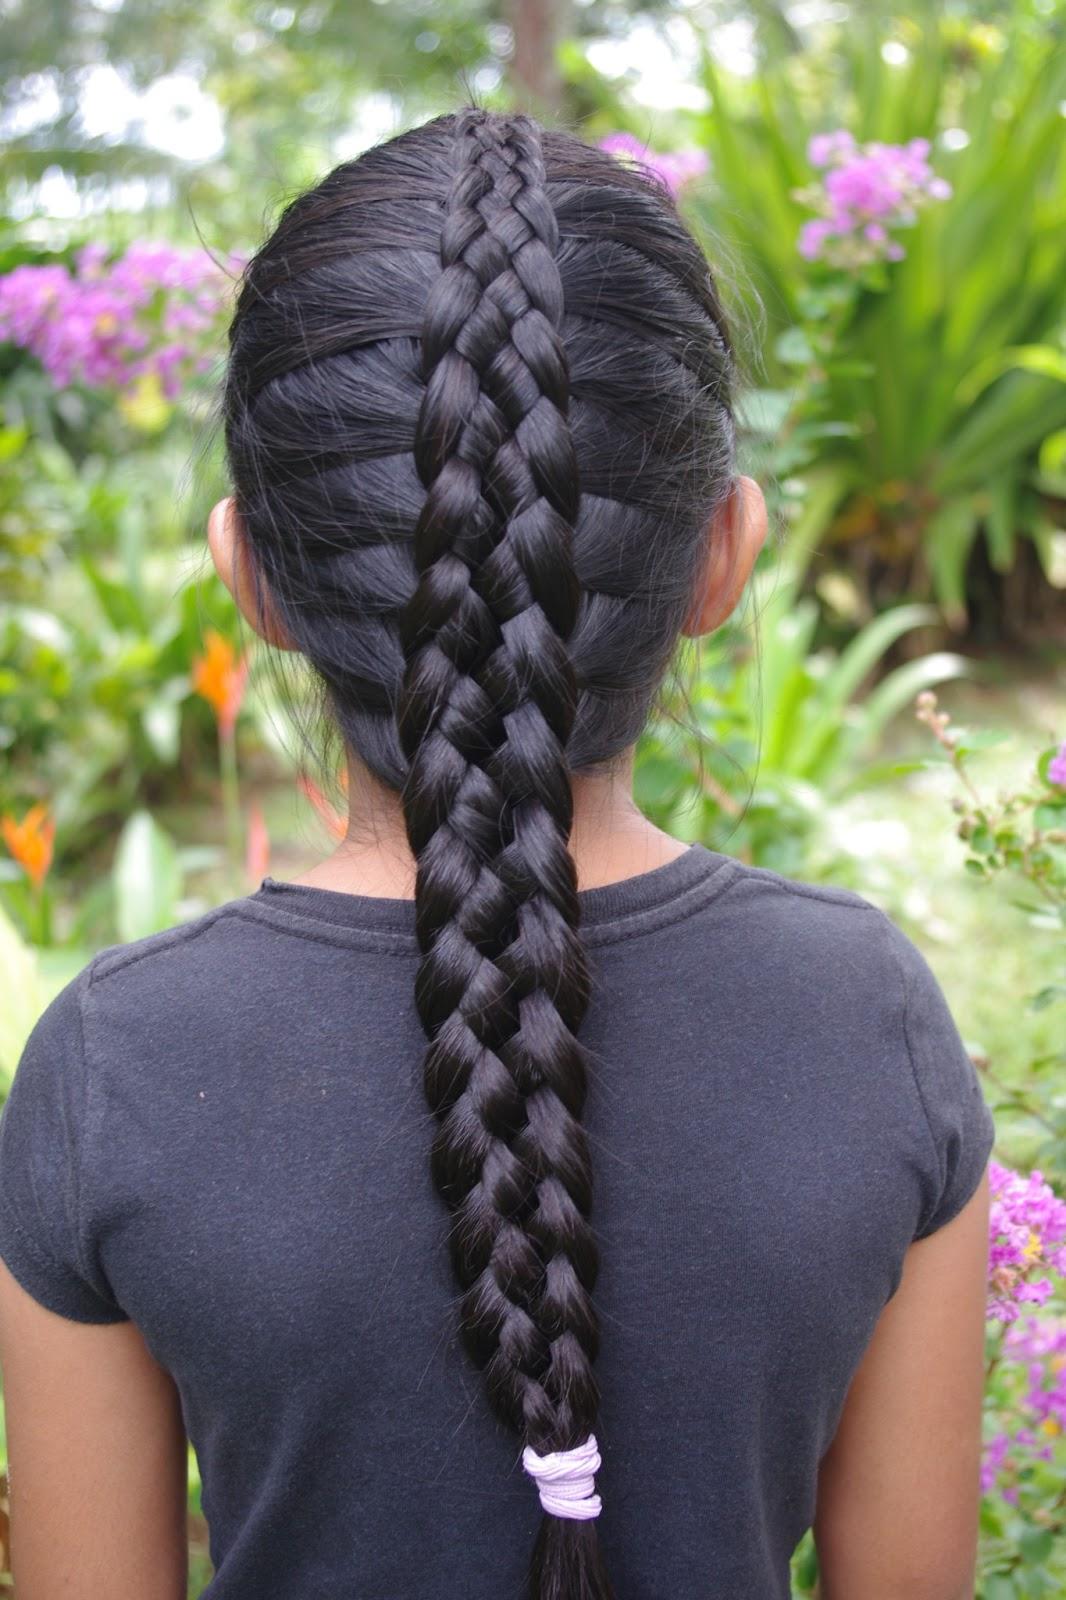 Braids  Hairstyles for Super Long Hair Micronesian Girl 6Strand French Braid